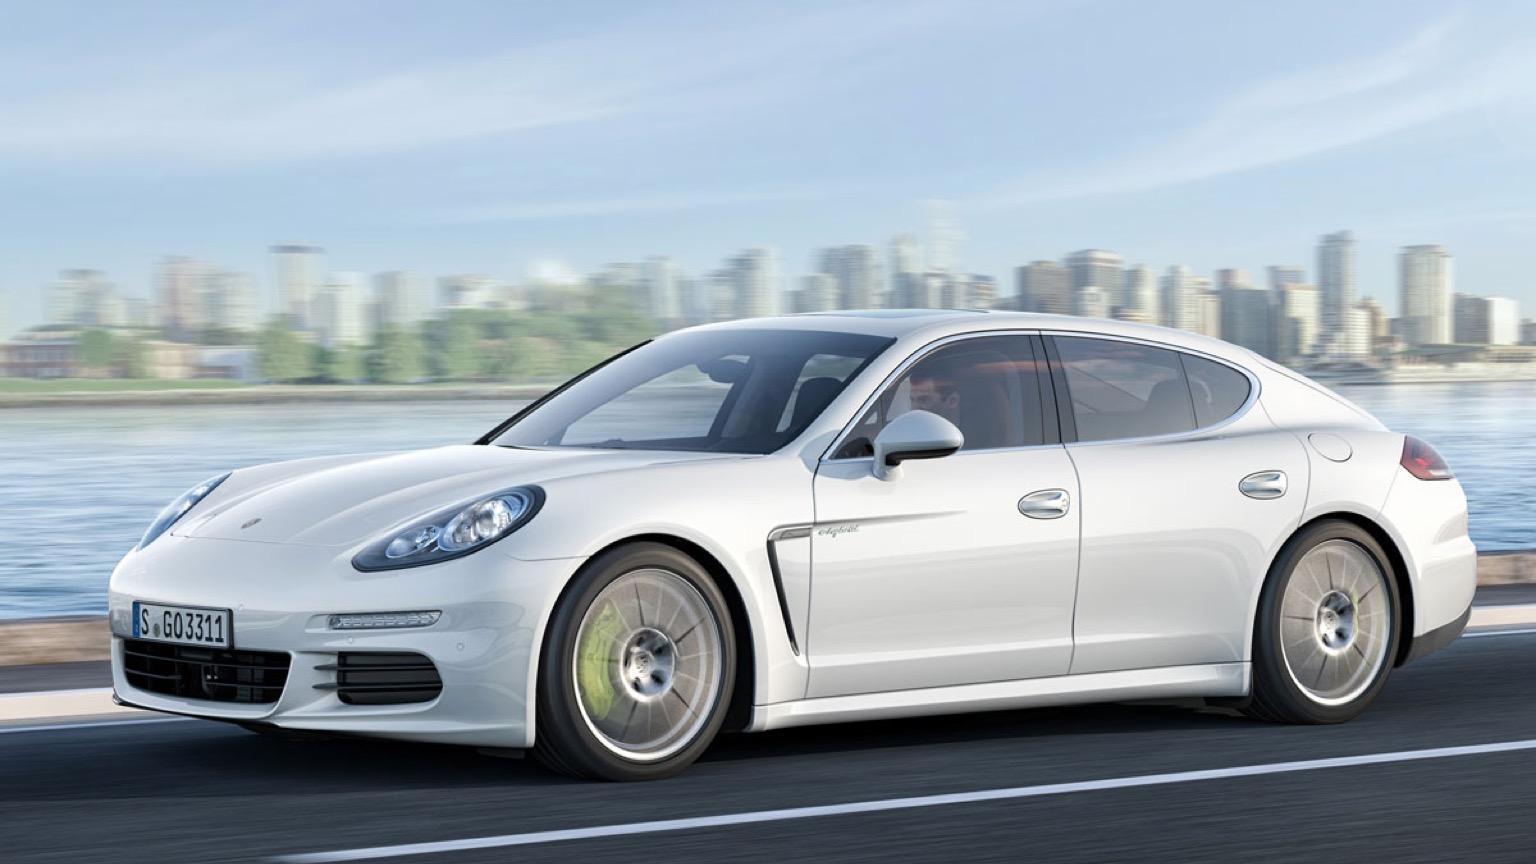 Porsche Panamera S E-Hybrid (2013)